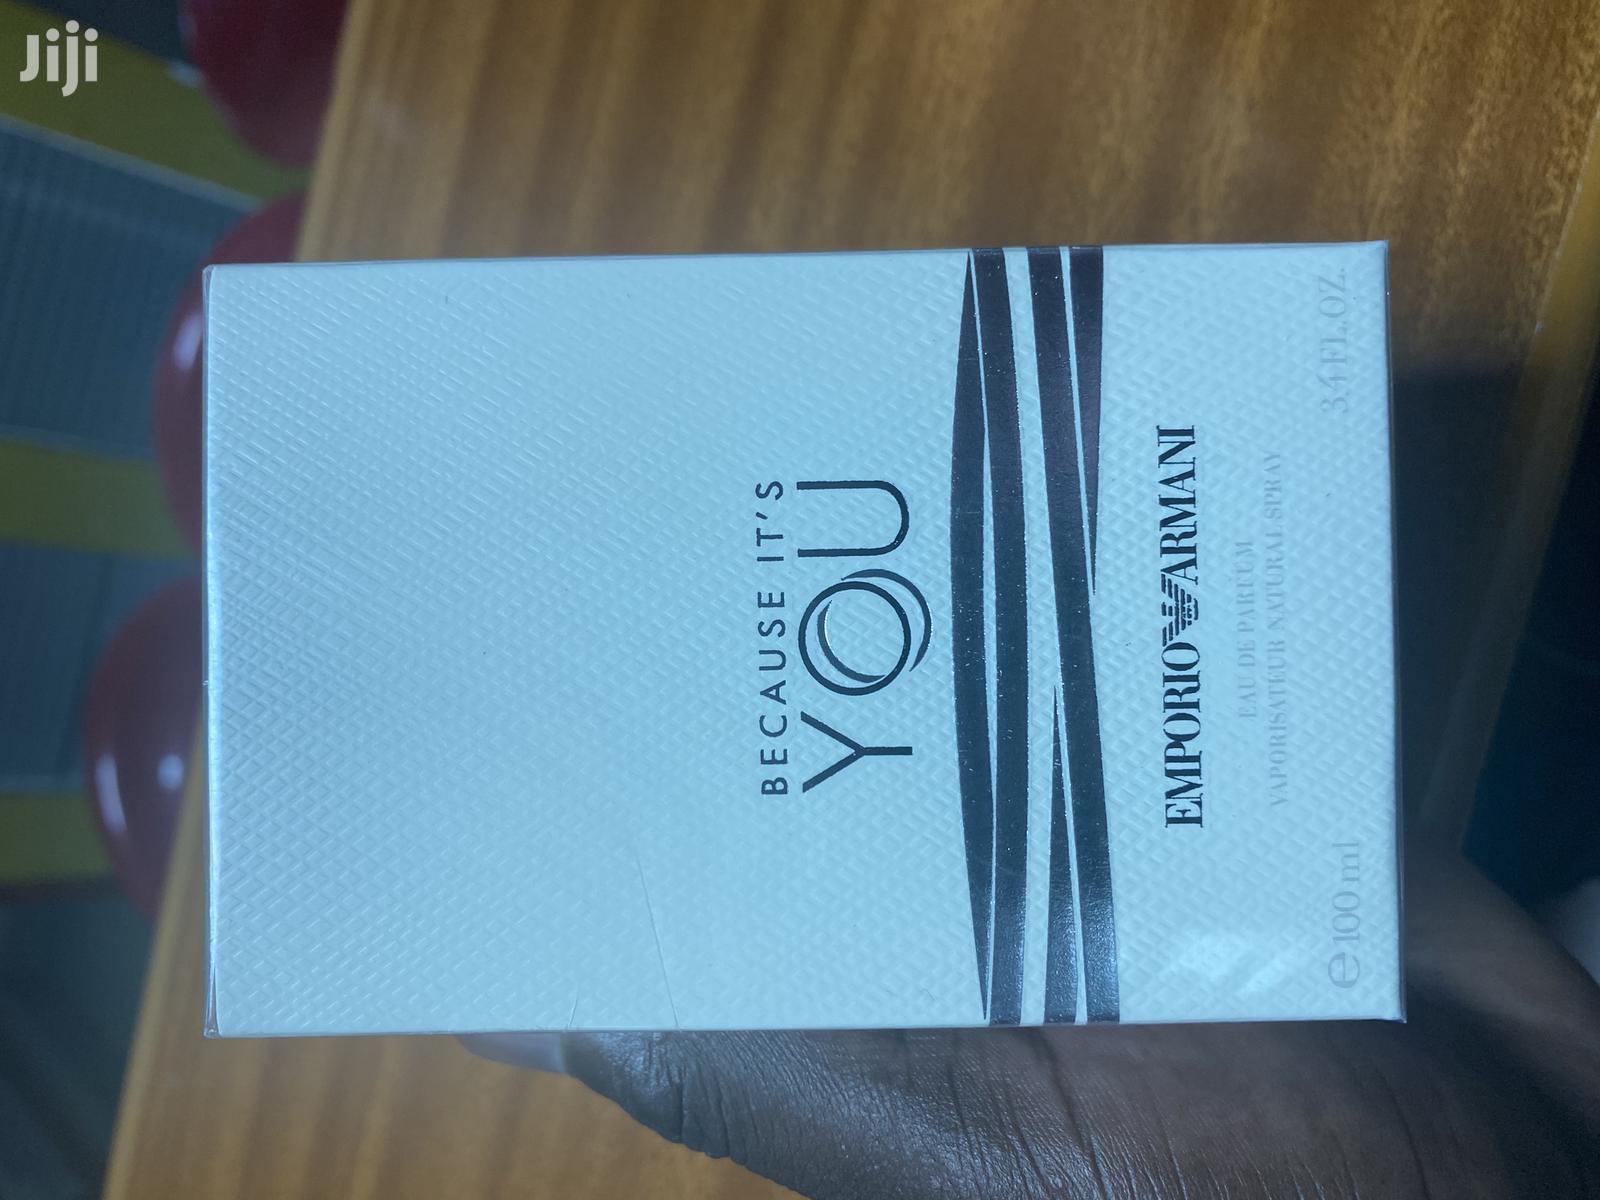 Giorgio Armani Women's Spray 100 Ml